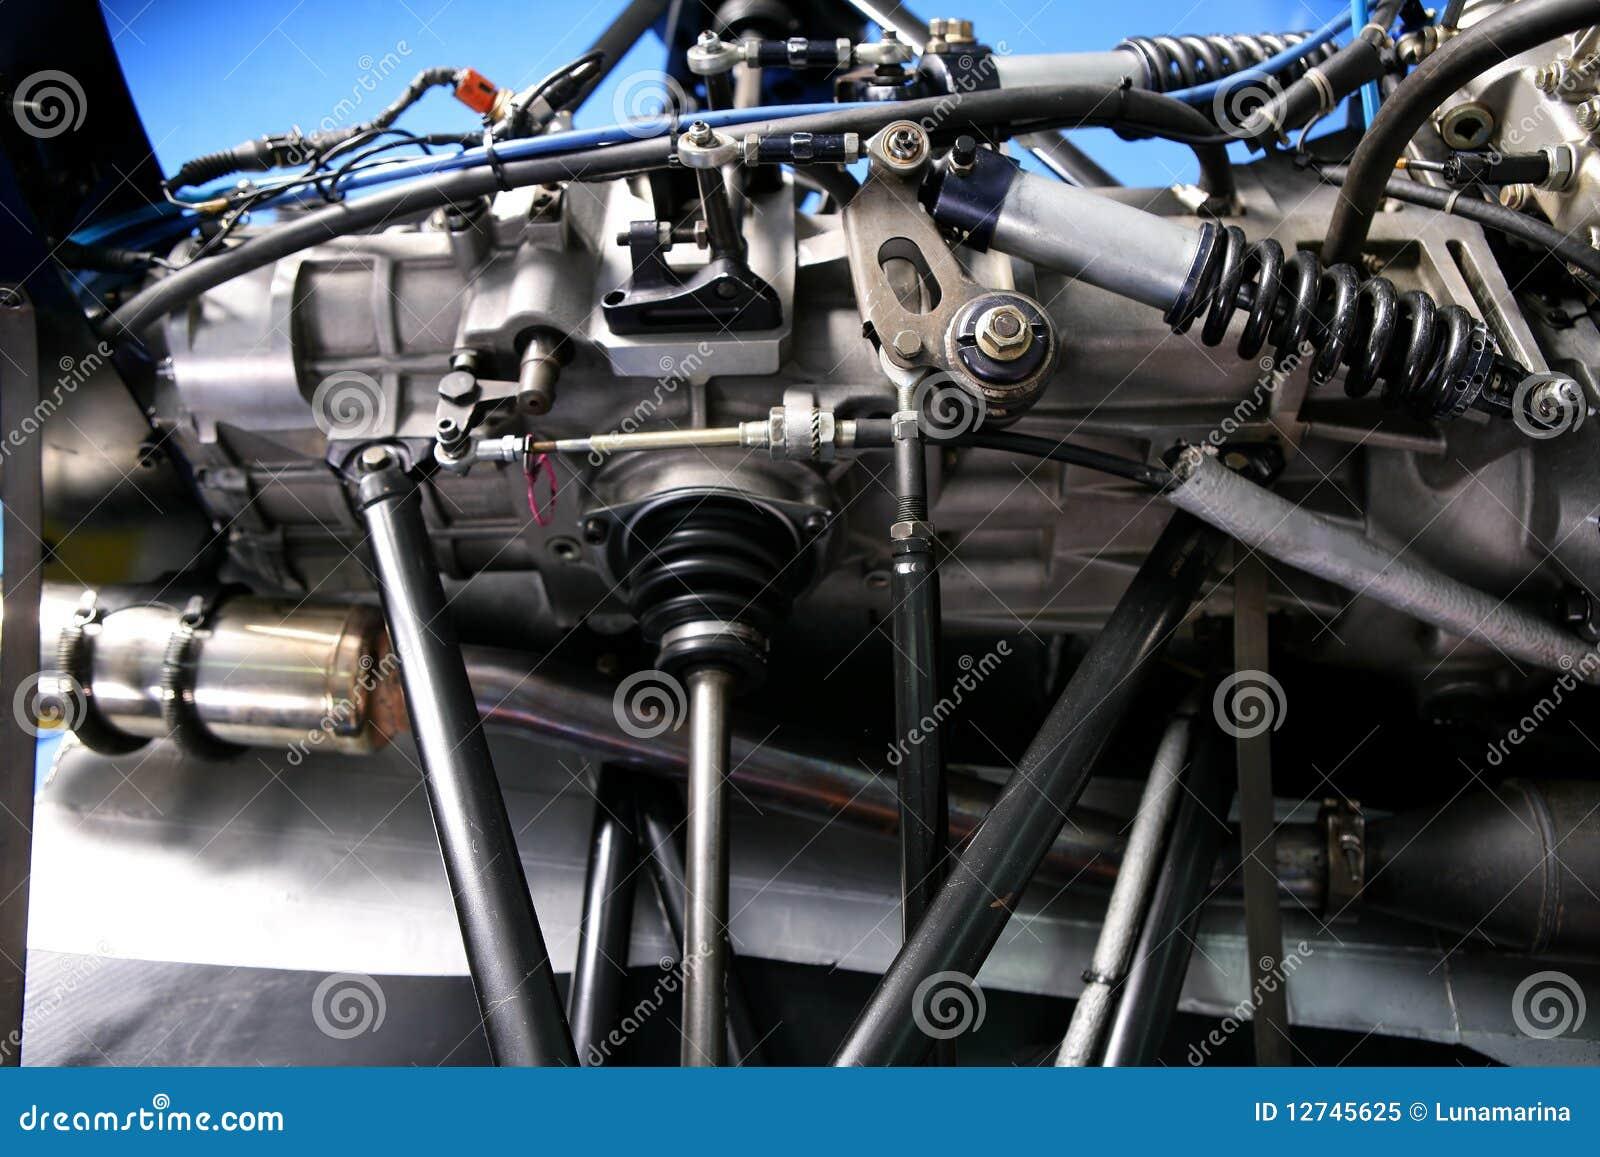 Drive Circuit Detail